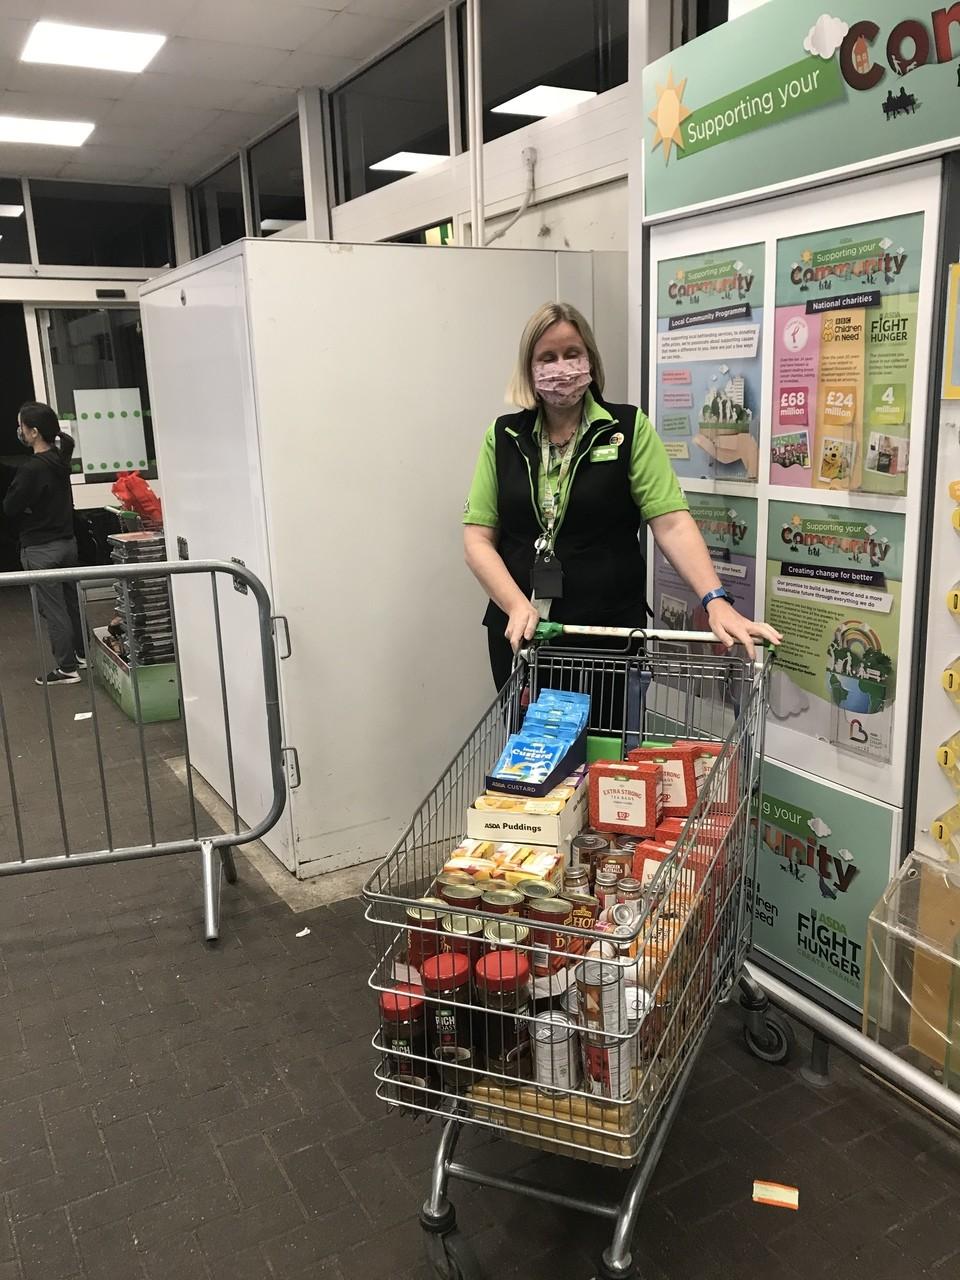 Gillingham Foodbank hampers and hygiene products donation | Asda Gillingham